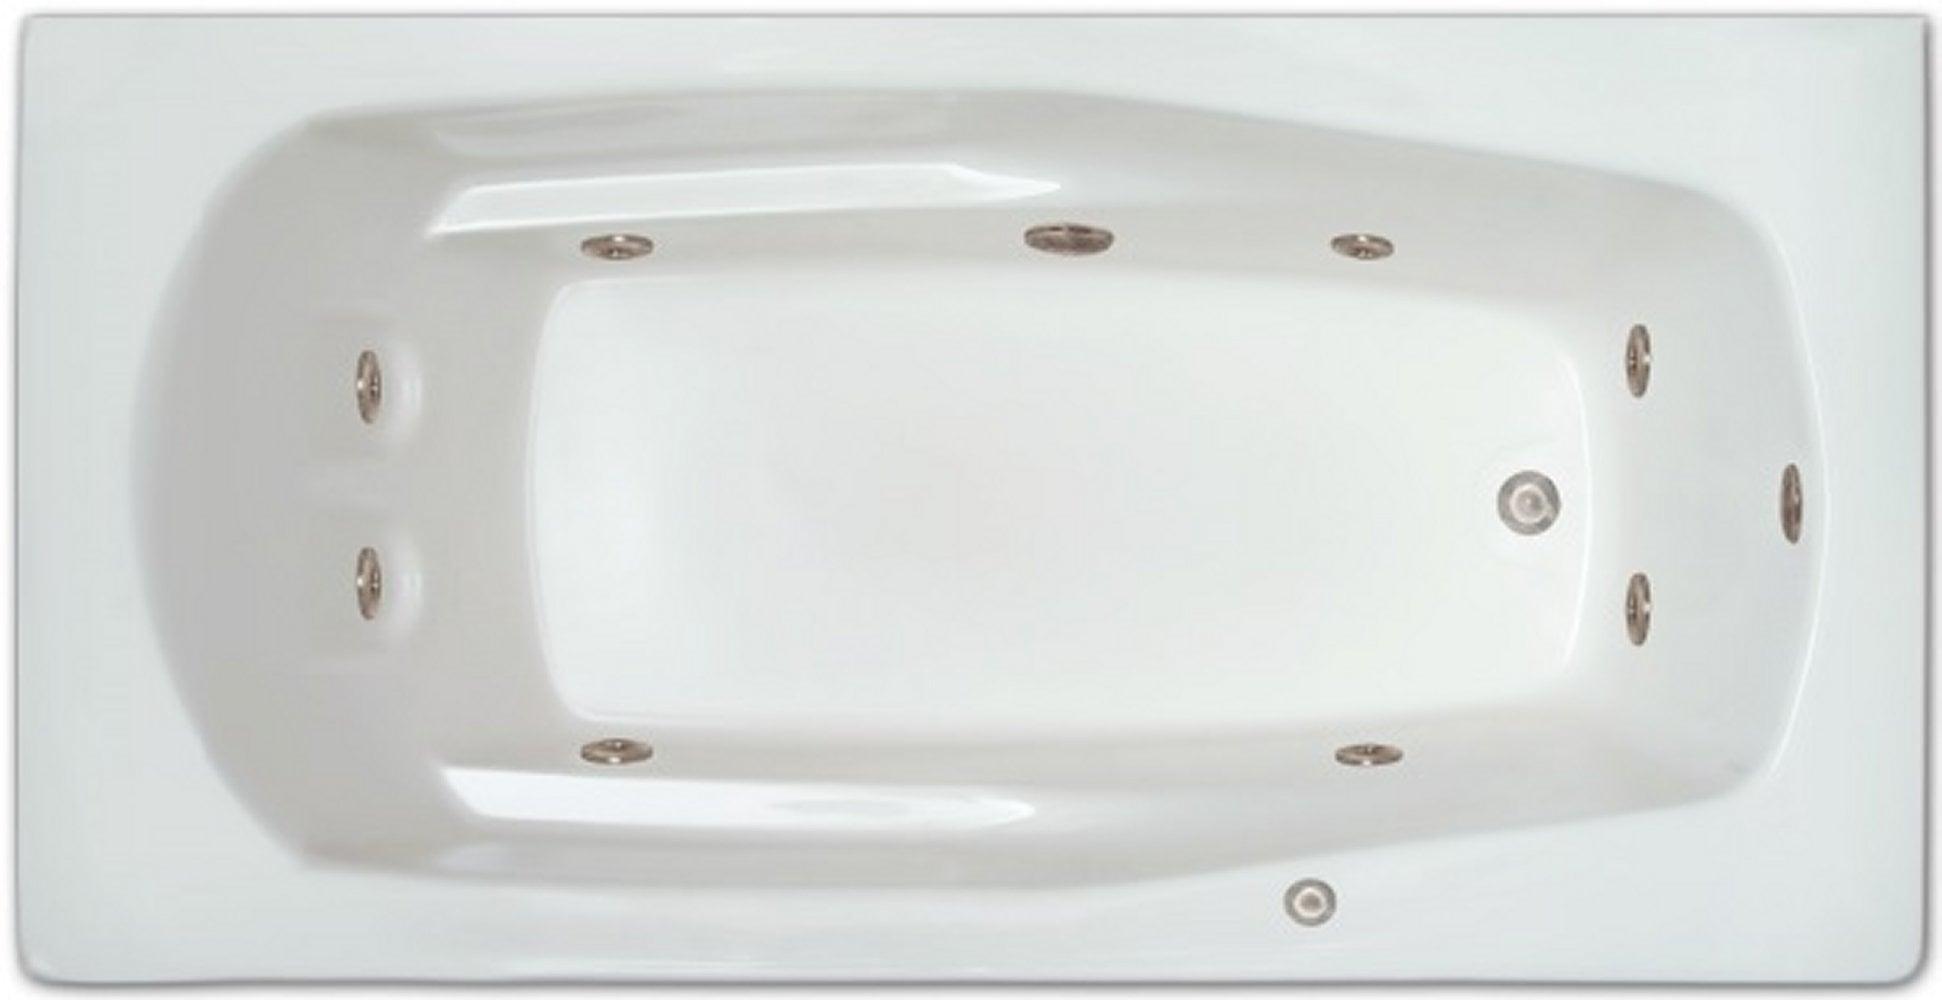 Drop-in Bathtub / 66x32x18.5 / high gloss white acrylic / Rectangle / LPI19-W-LD Pinnacle Bath - Whirlpool 0